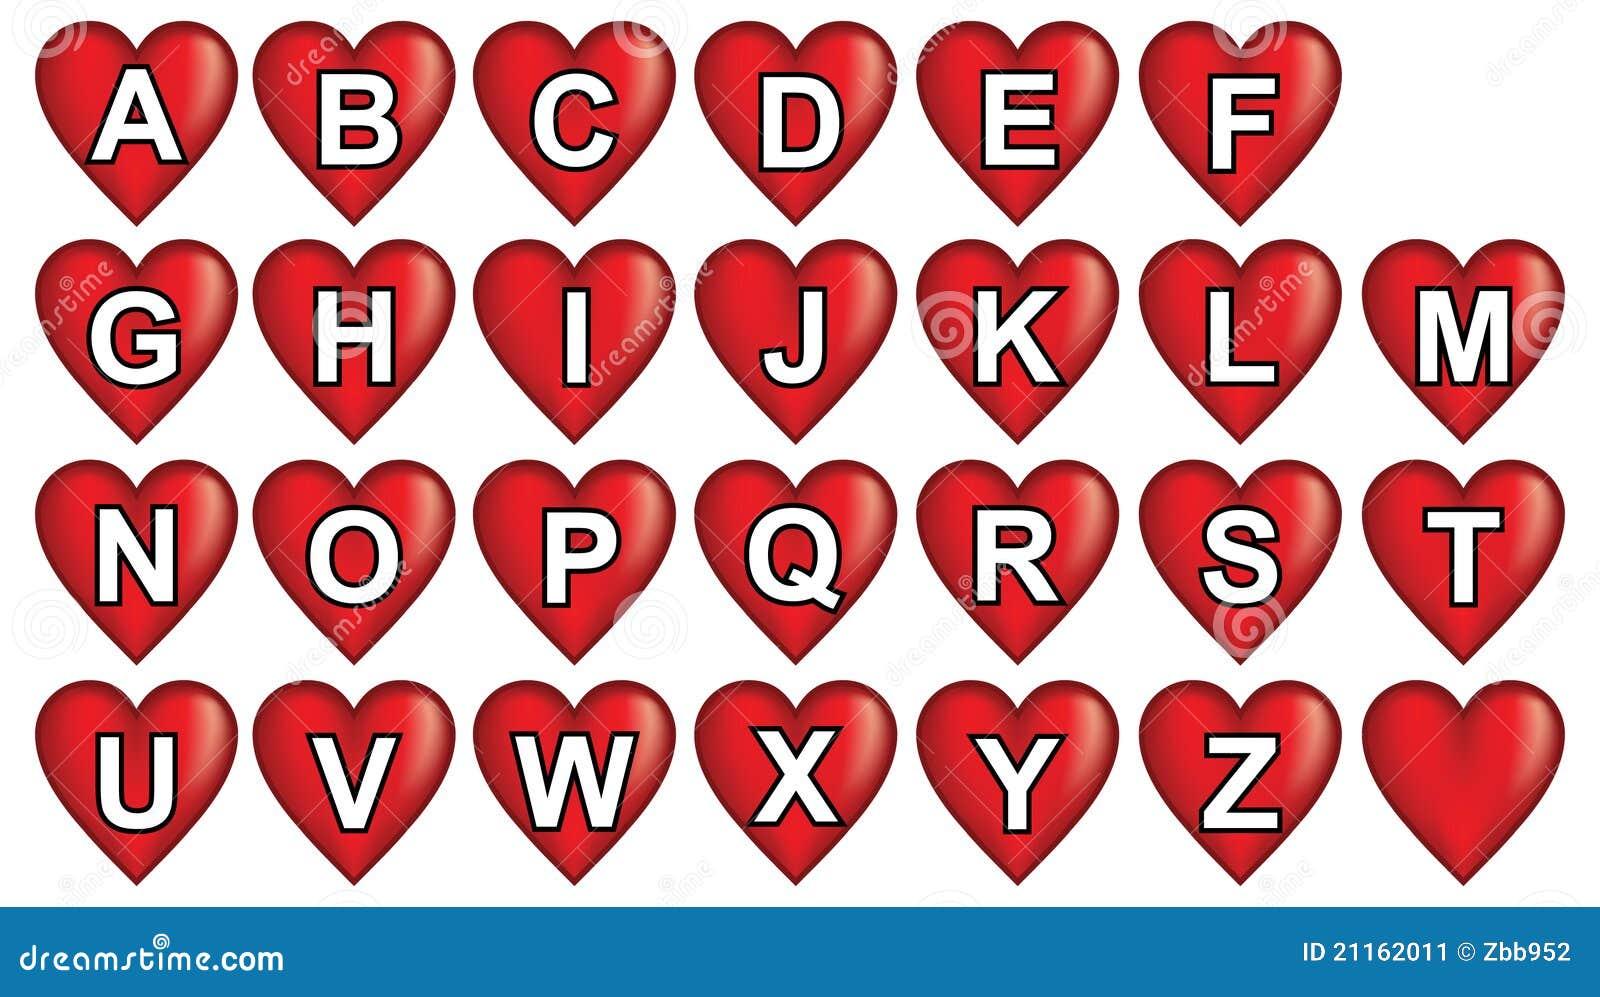 m Alphabet Wallpaper images  Hdimagelib